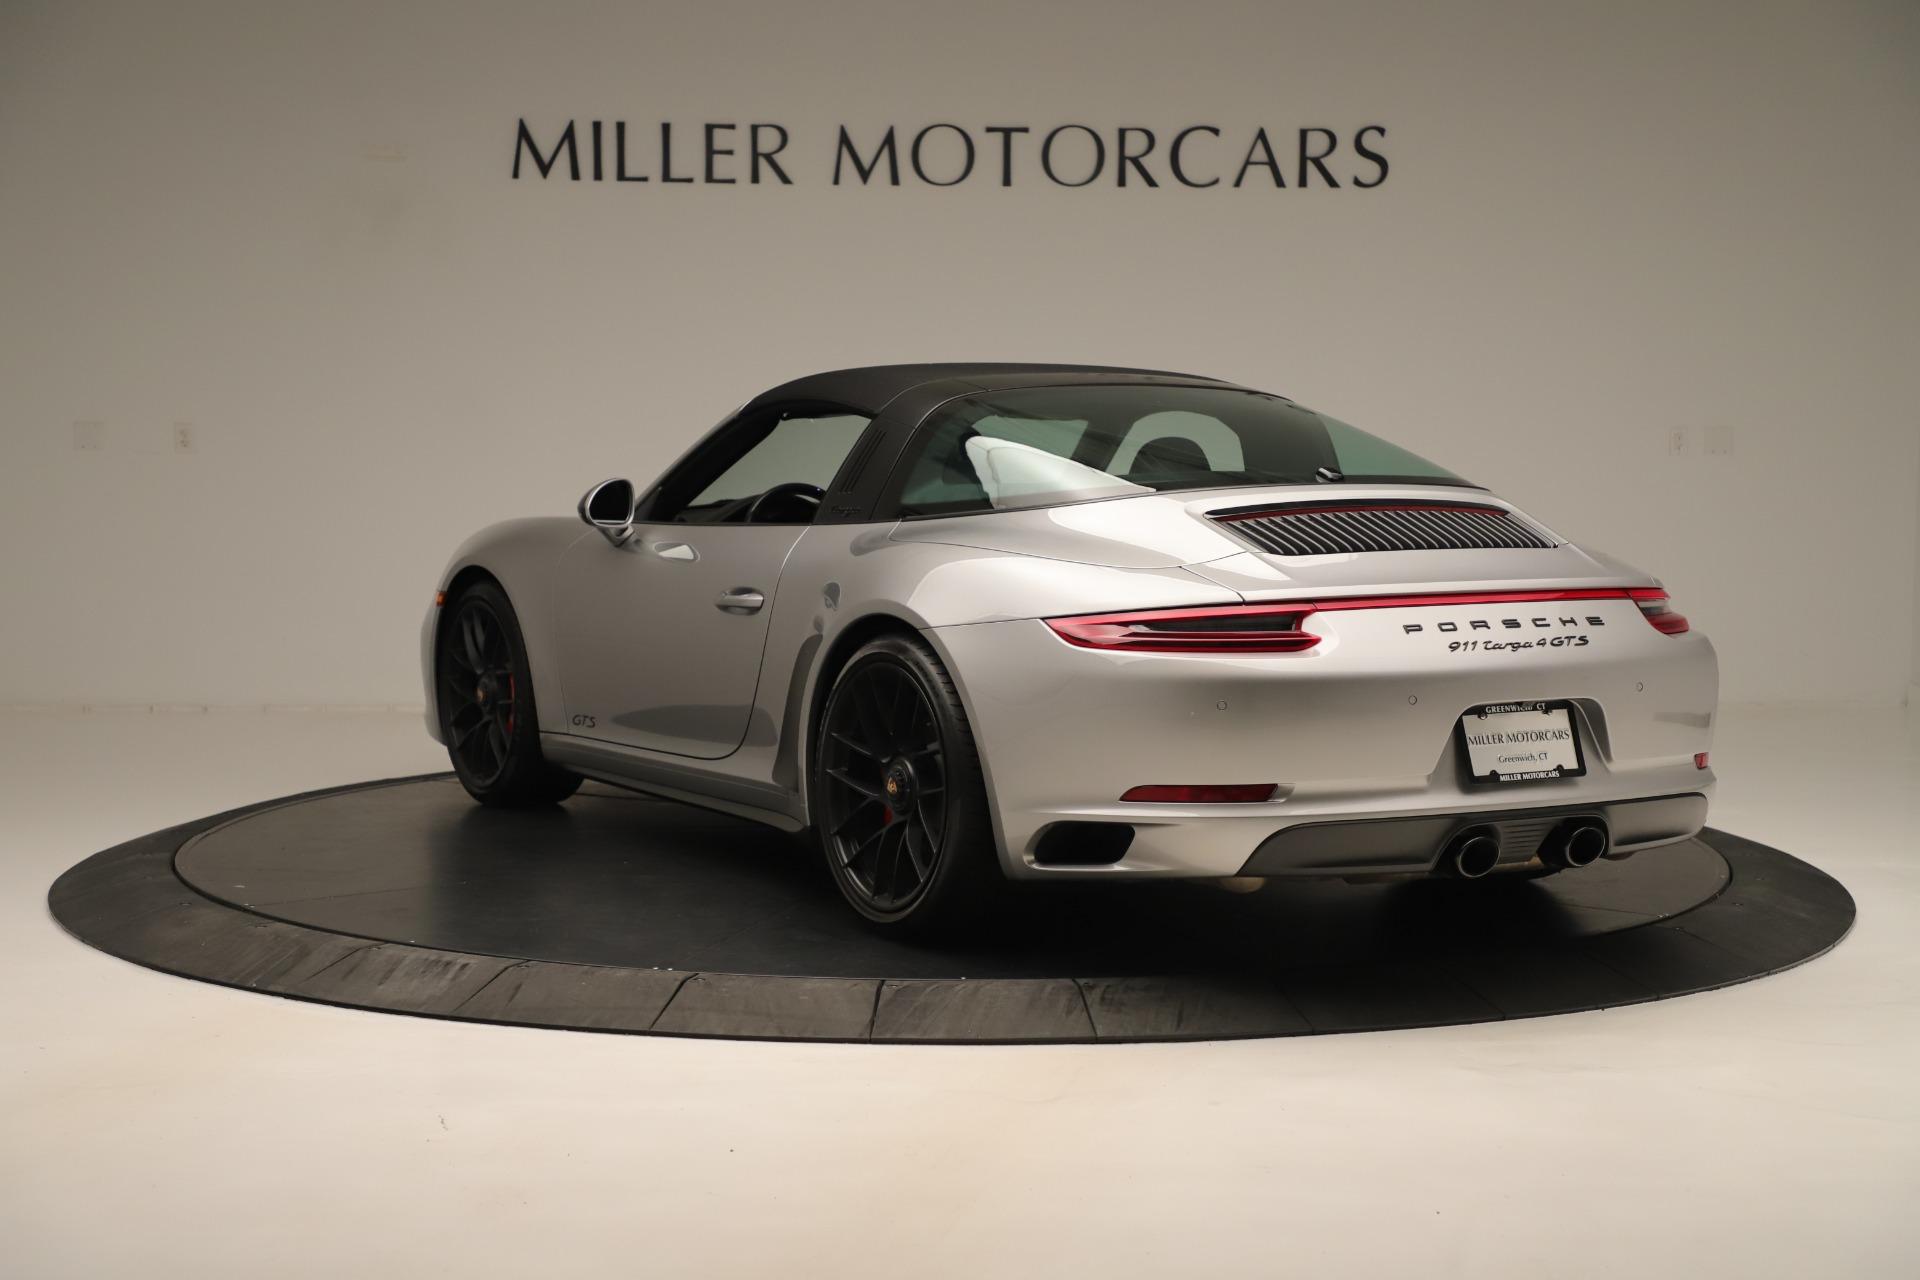 Used 2017 Porsche 911 Targa 4 GTS